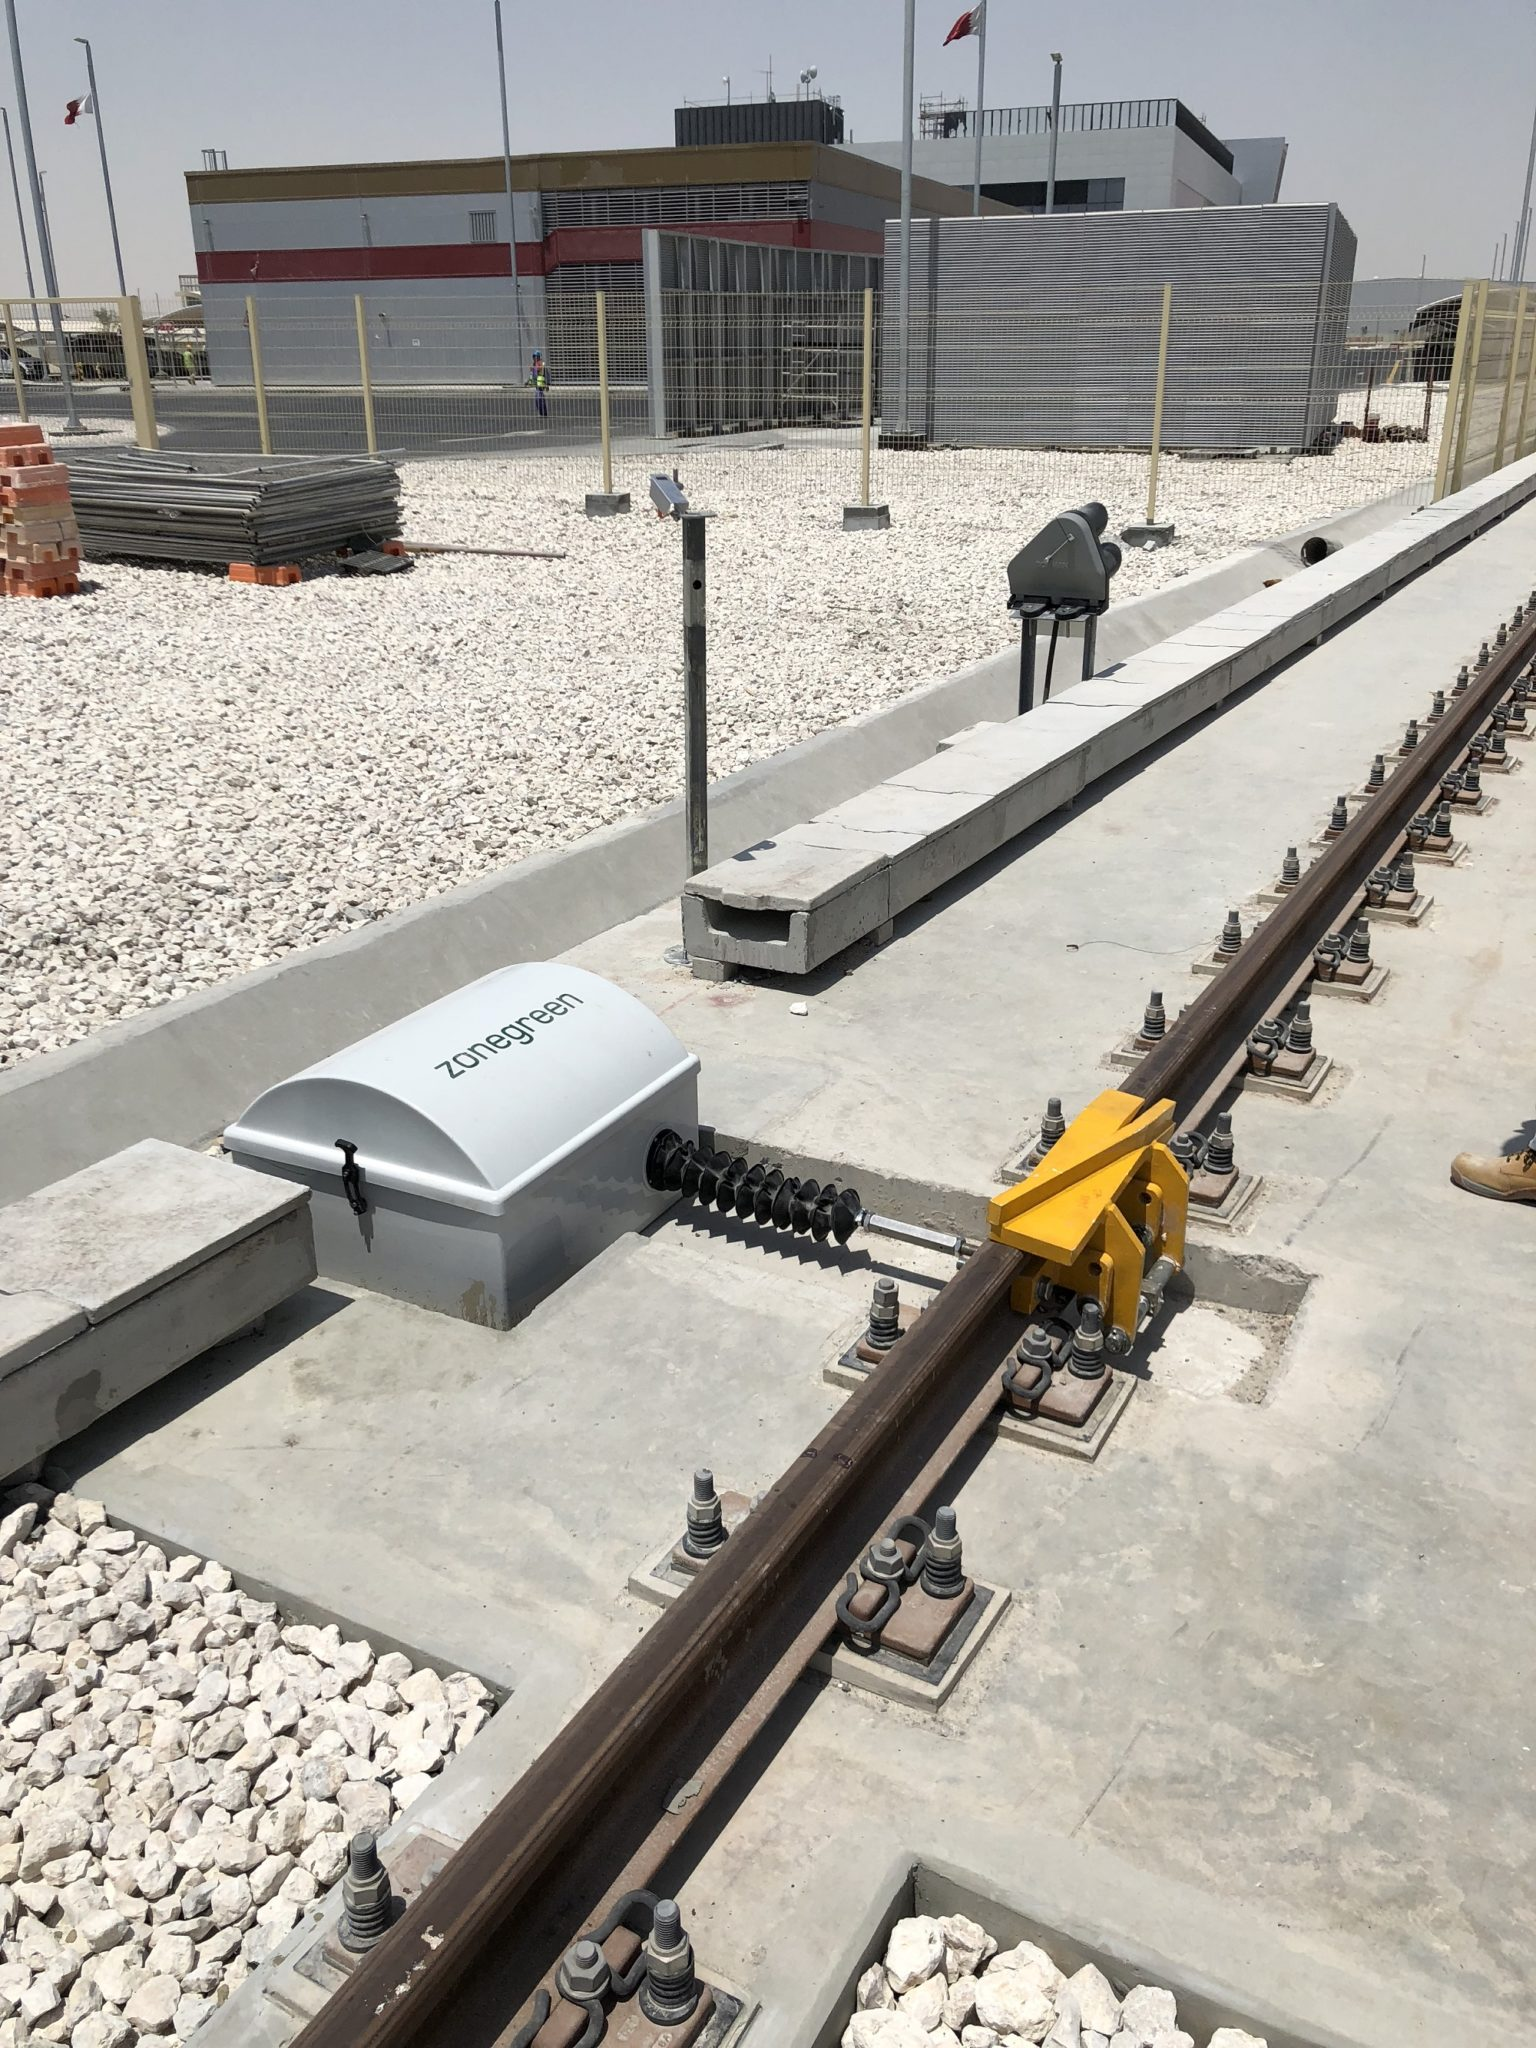 Zonegreen Derailer for Depot Safety